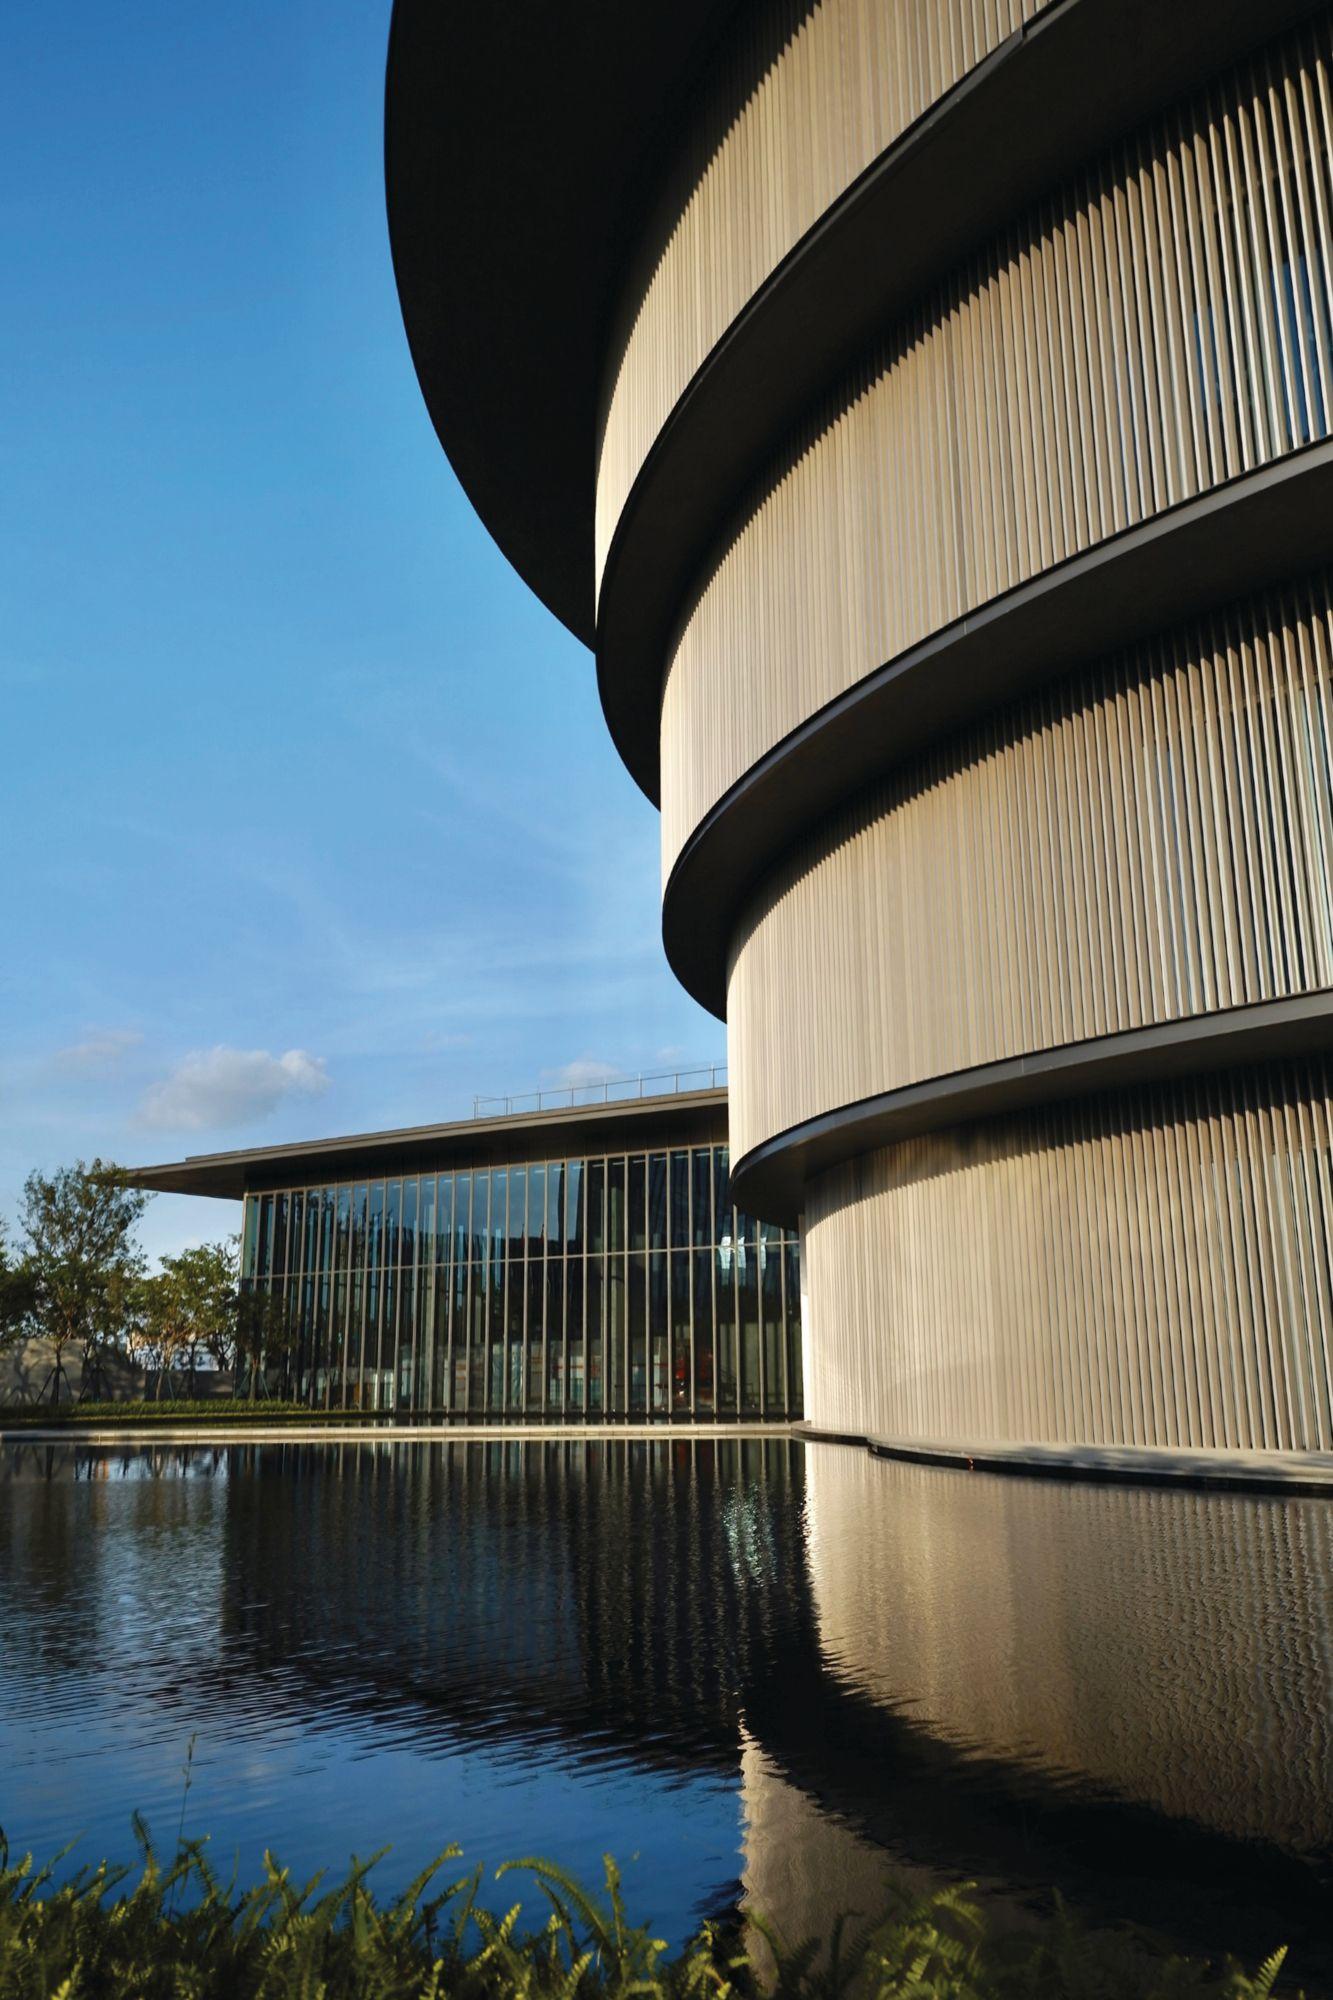 The distinctive building was designed by celebrated Japanese architect Tadao Ando (Photo: Courtesy of HEM)